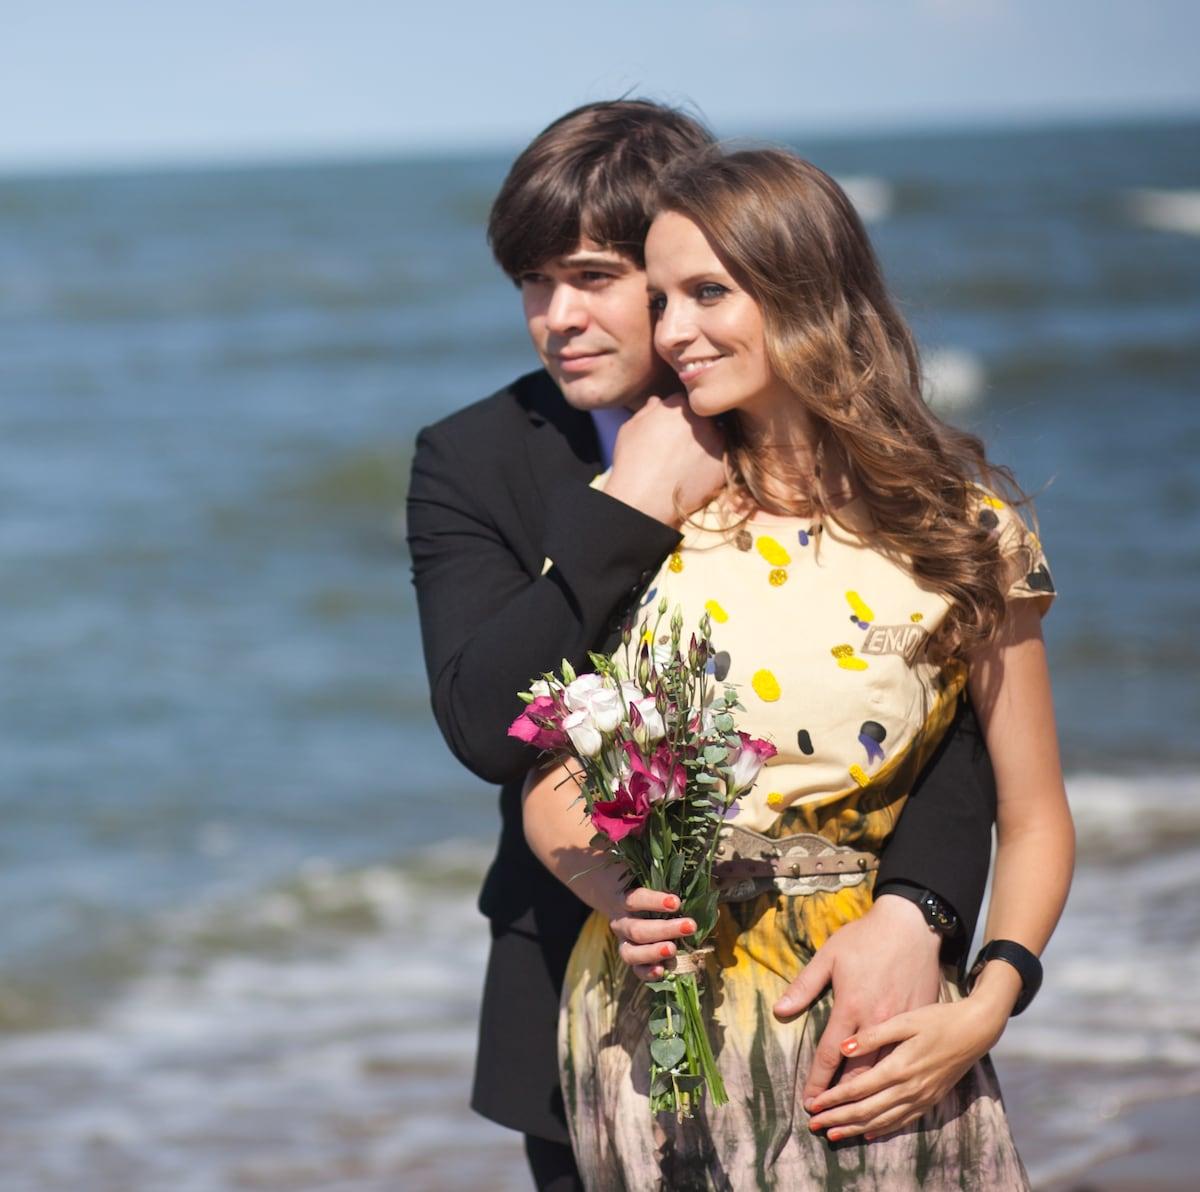 Jevgenij&Zaneta From Lithuania